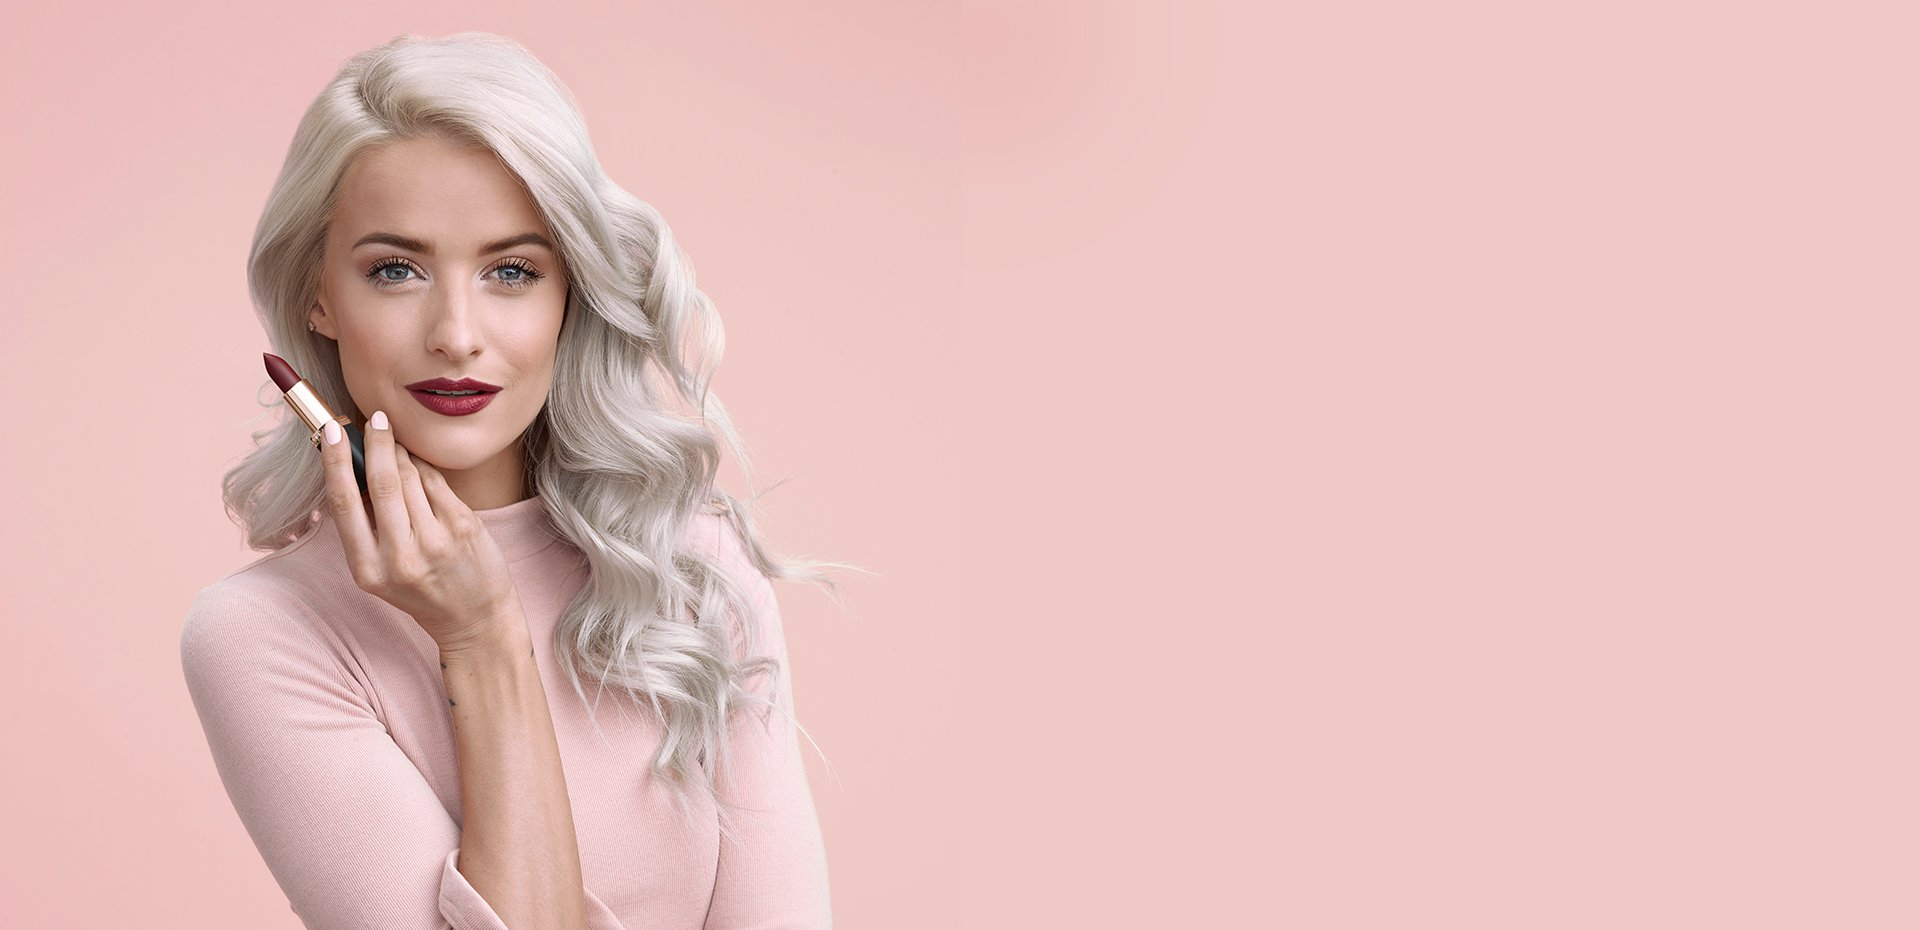 Buy Elegant Bridal Lingerie For Your First Night Or Honeymoon